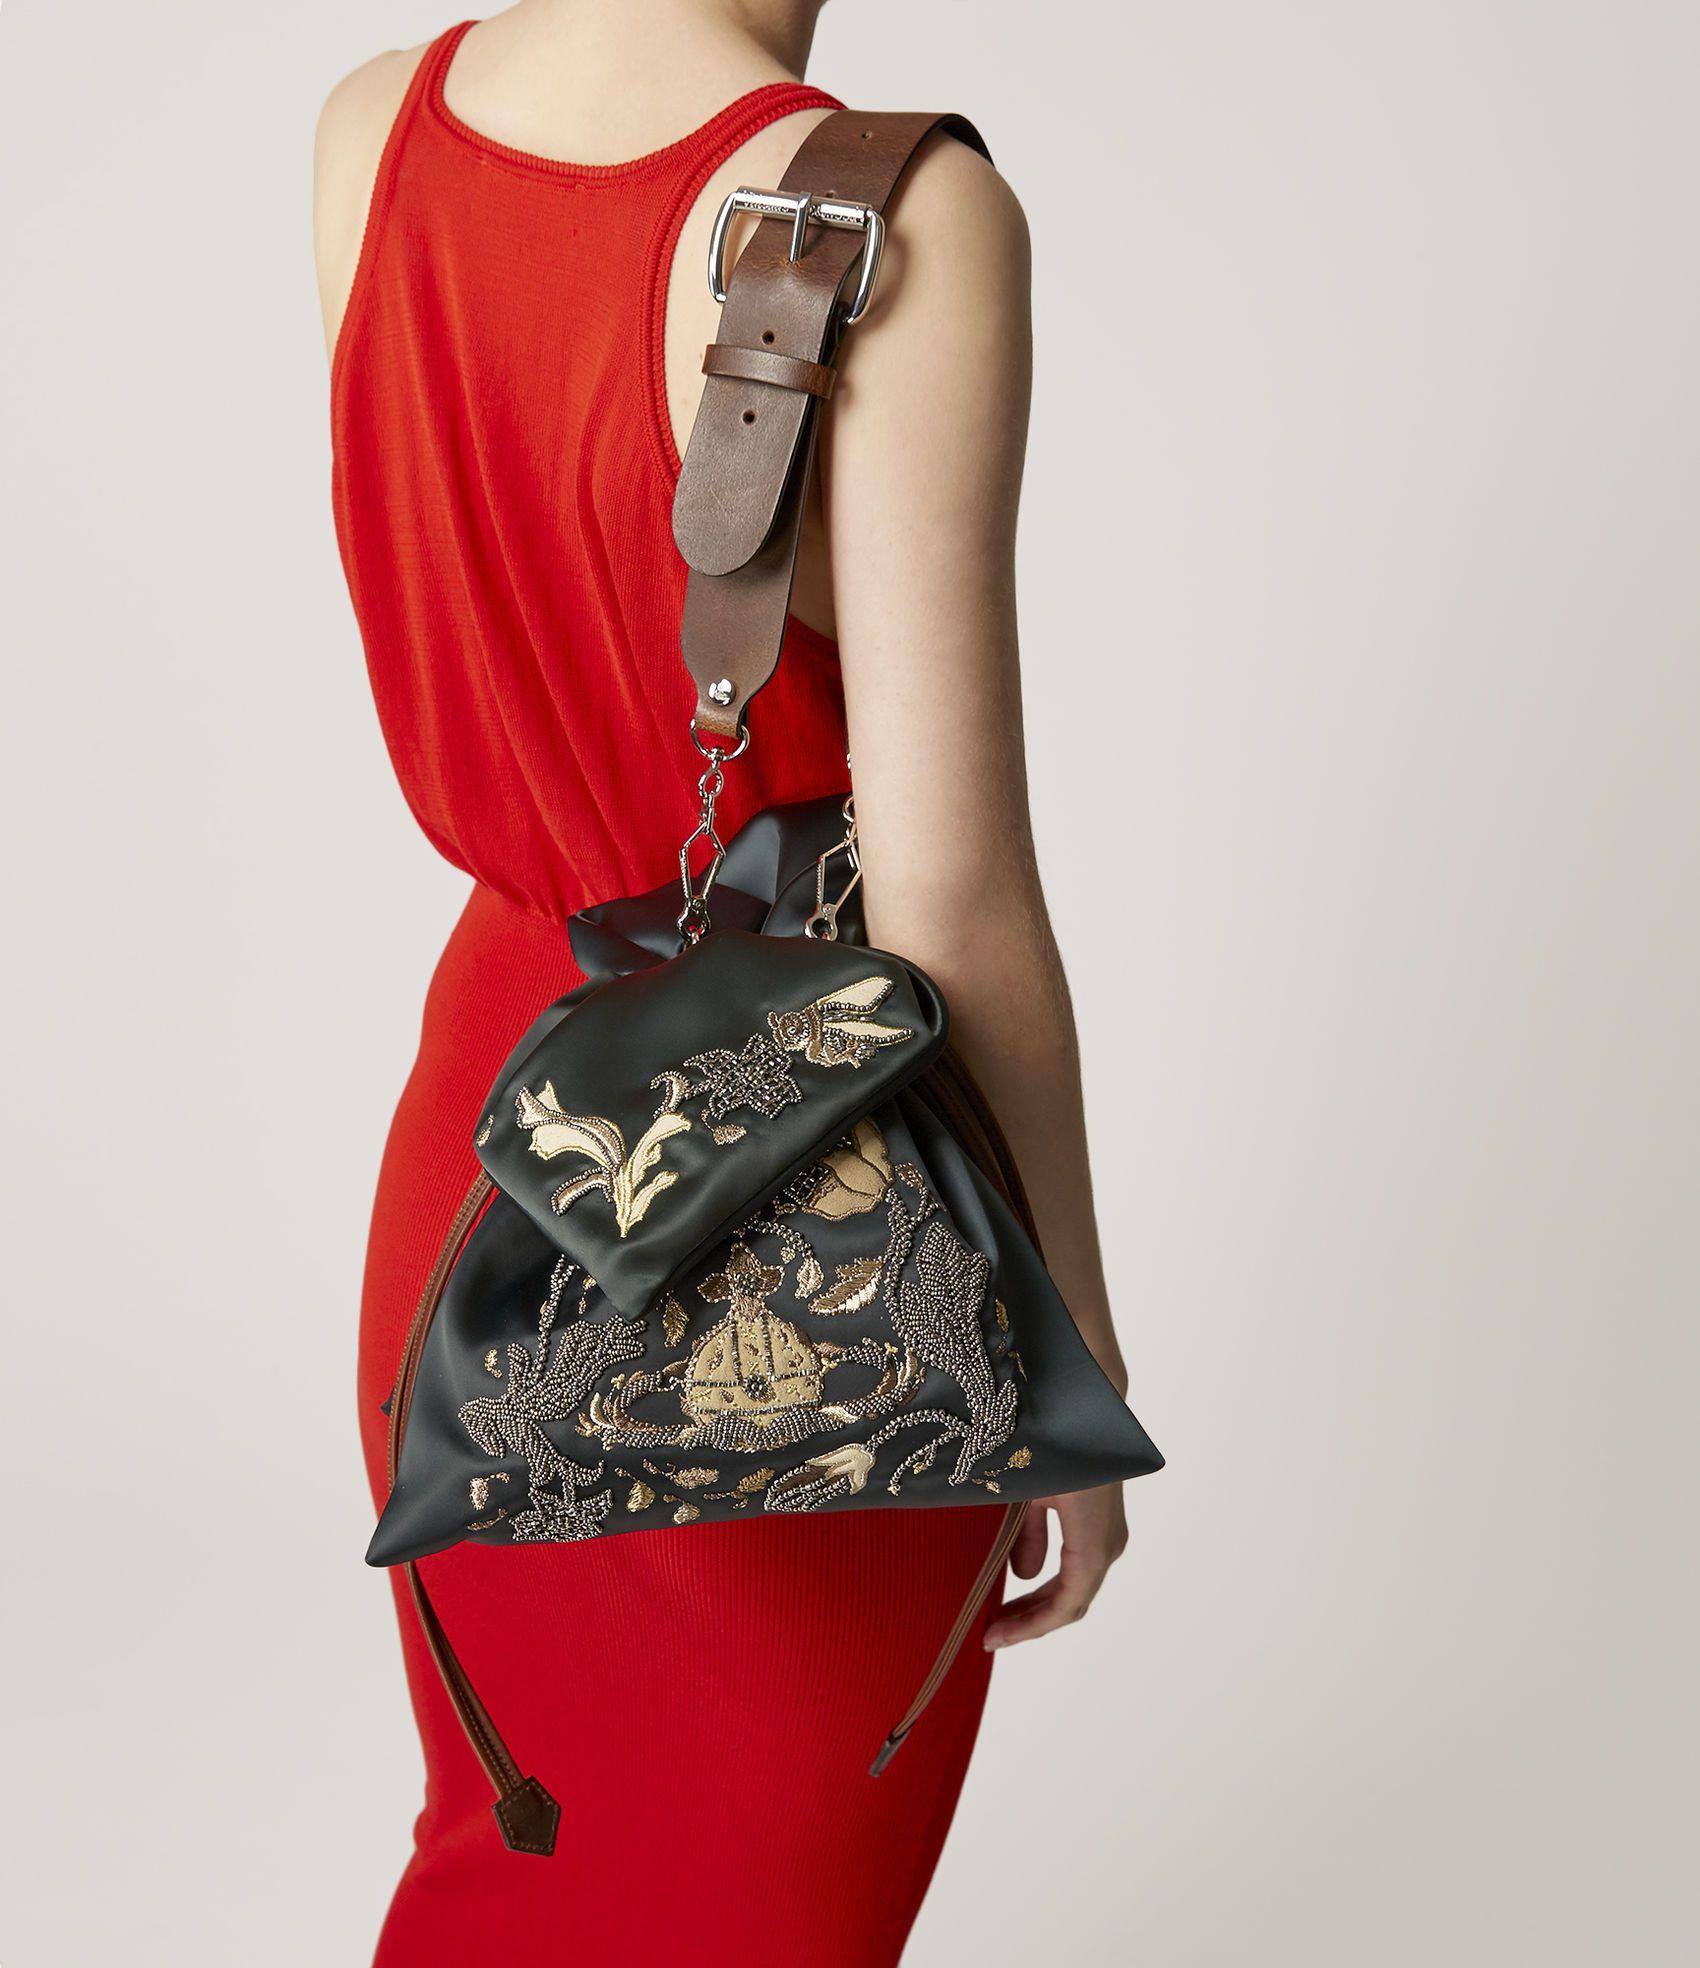 547bfea79 Vivienne Westwood Women's Designer Handbags | Shop Vivienne Westwood -  Satin Dolly Large Evening Bag